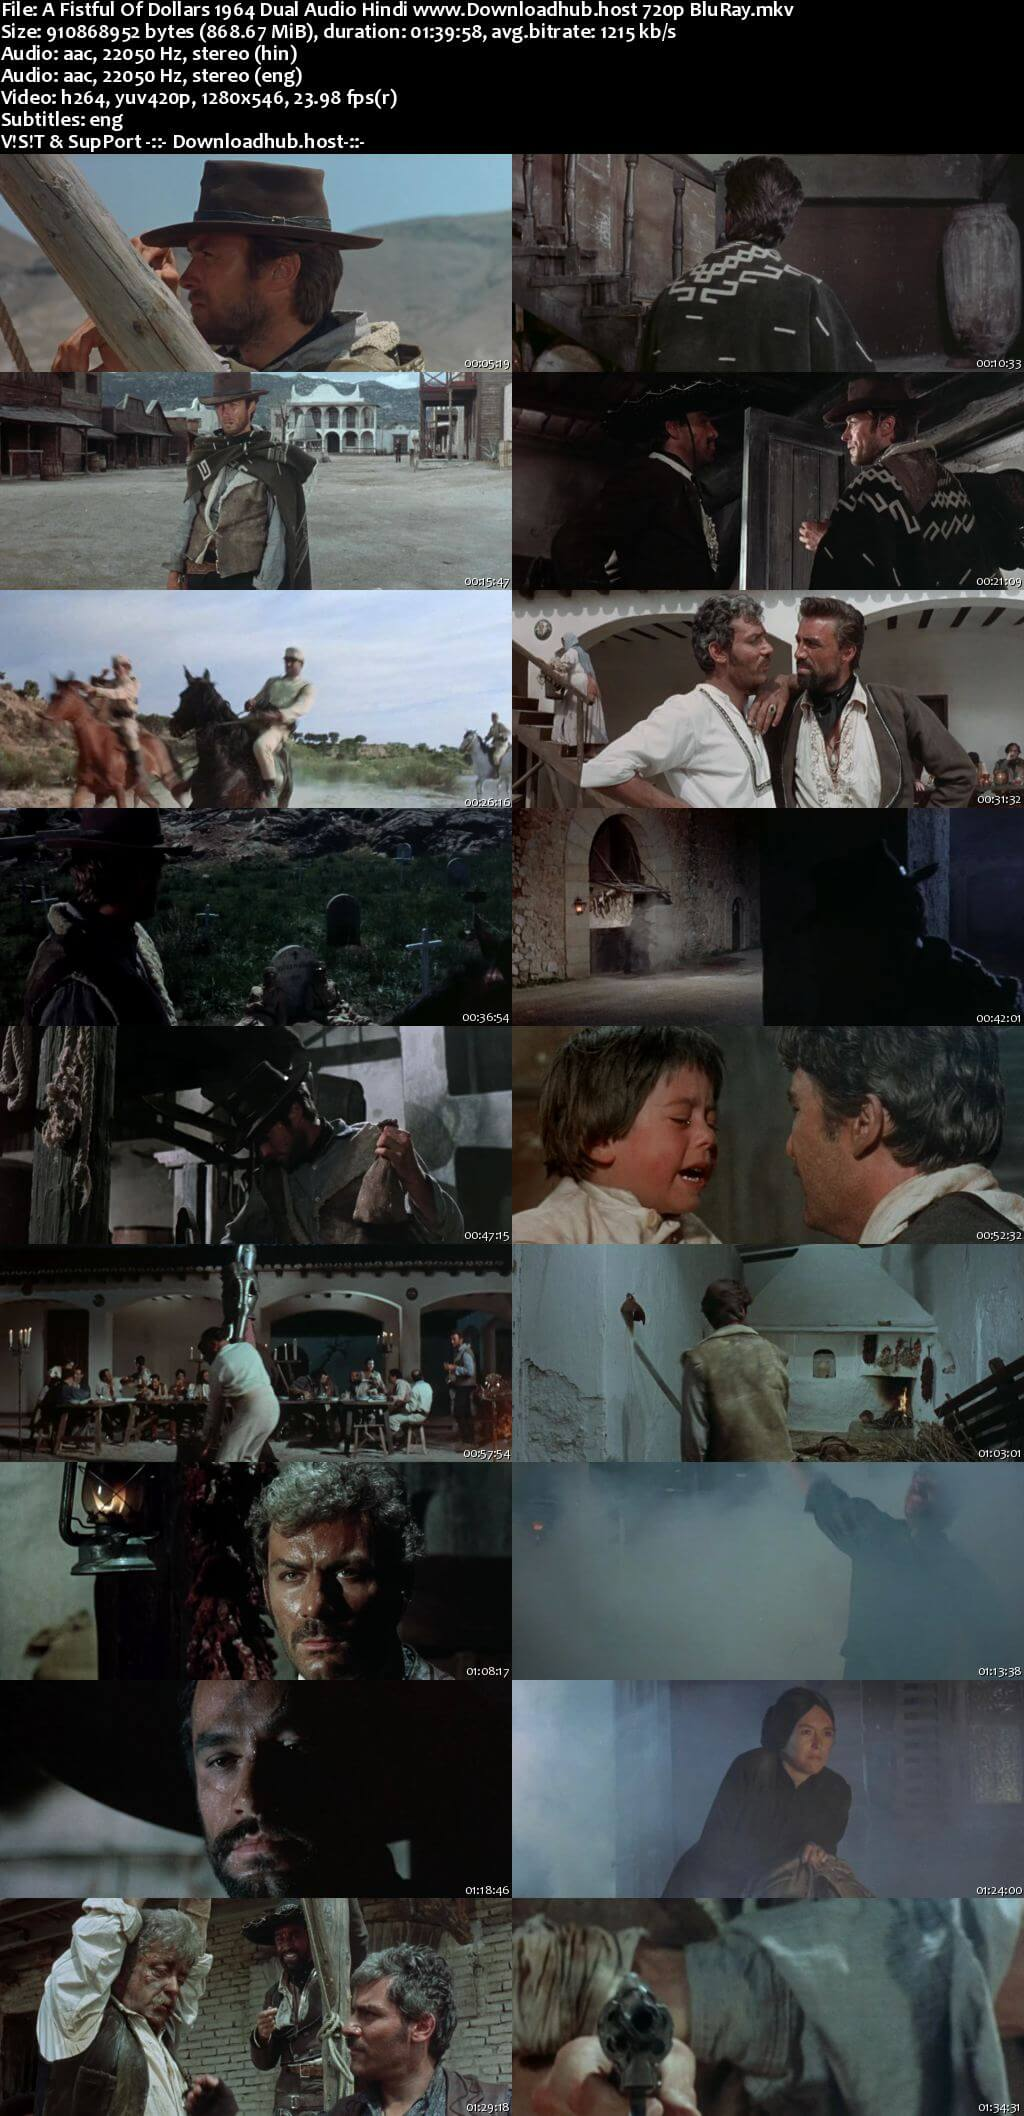 A Fistful of Dollars 1964 Hindi Dual Audio 720p BluRay ESubs